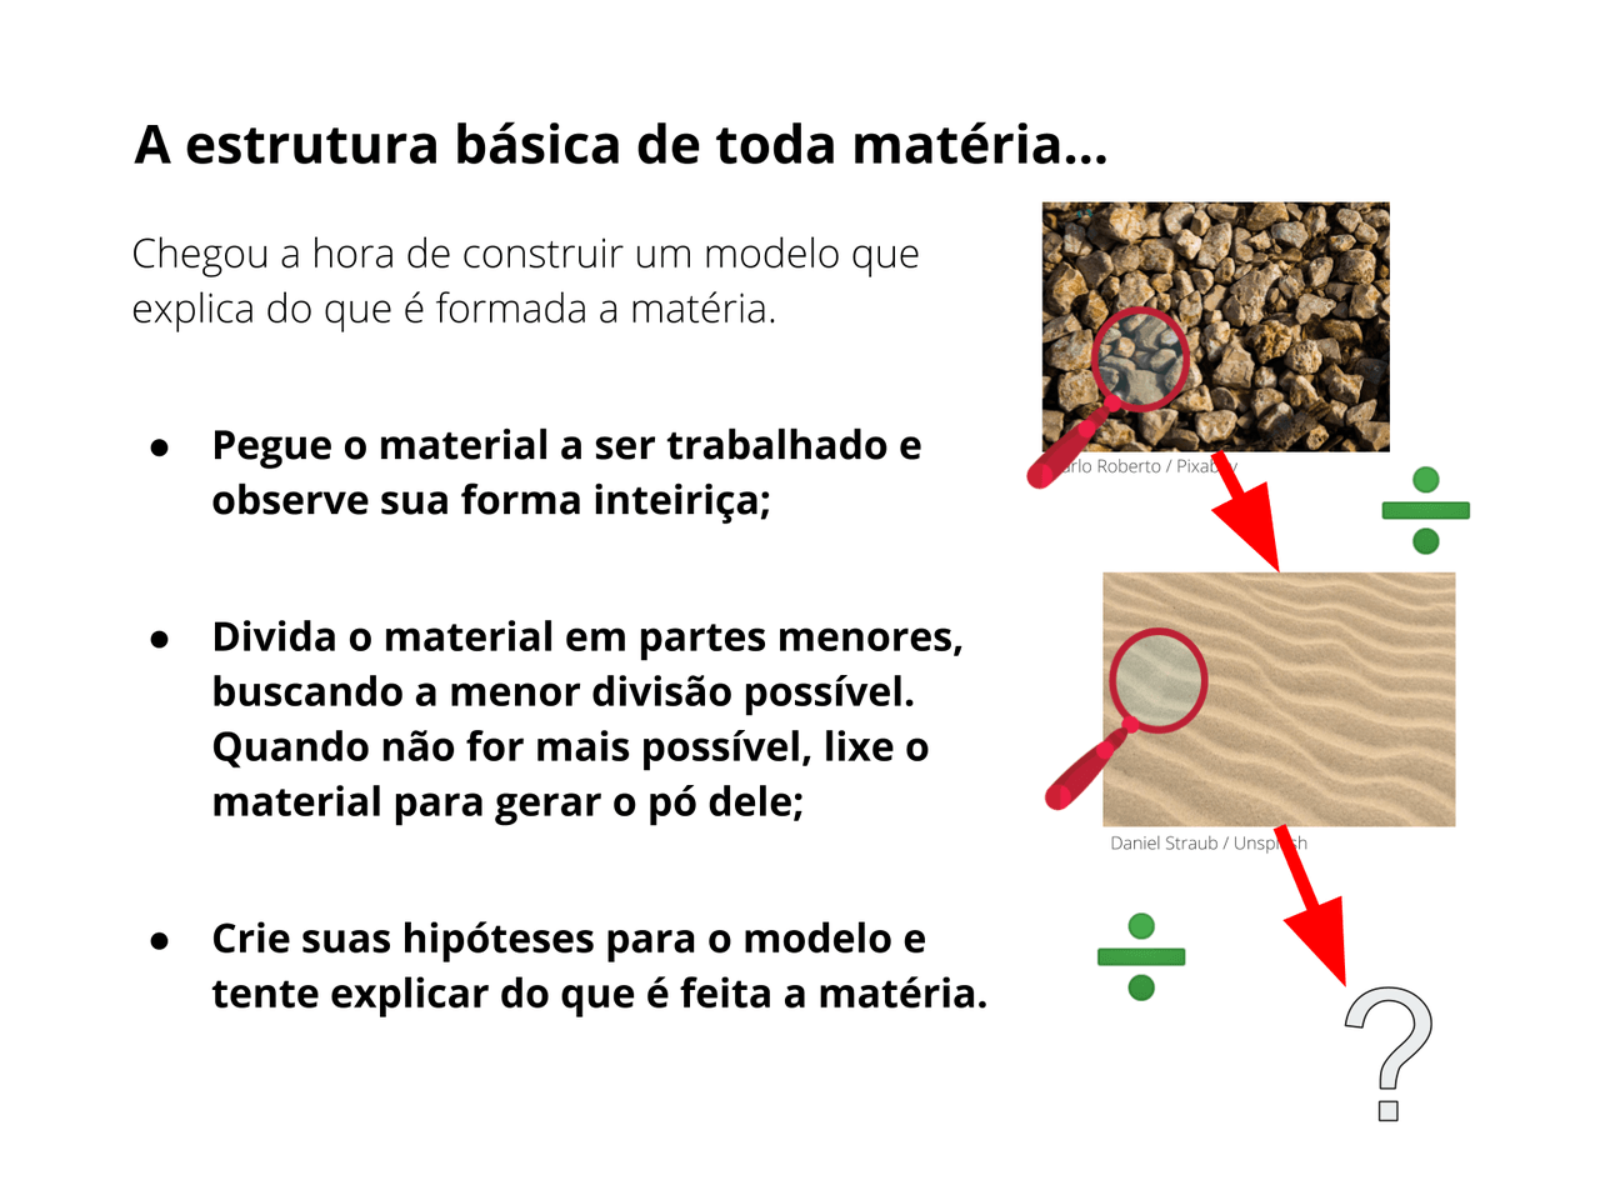 Do que a matéria é feita?